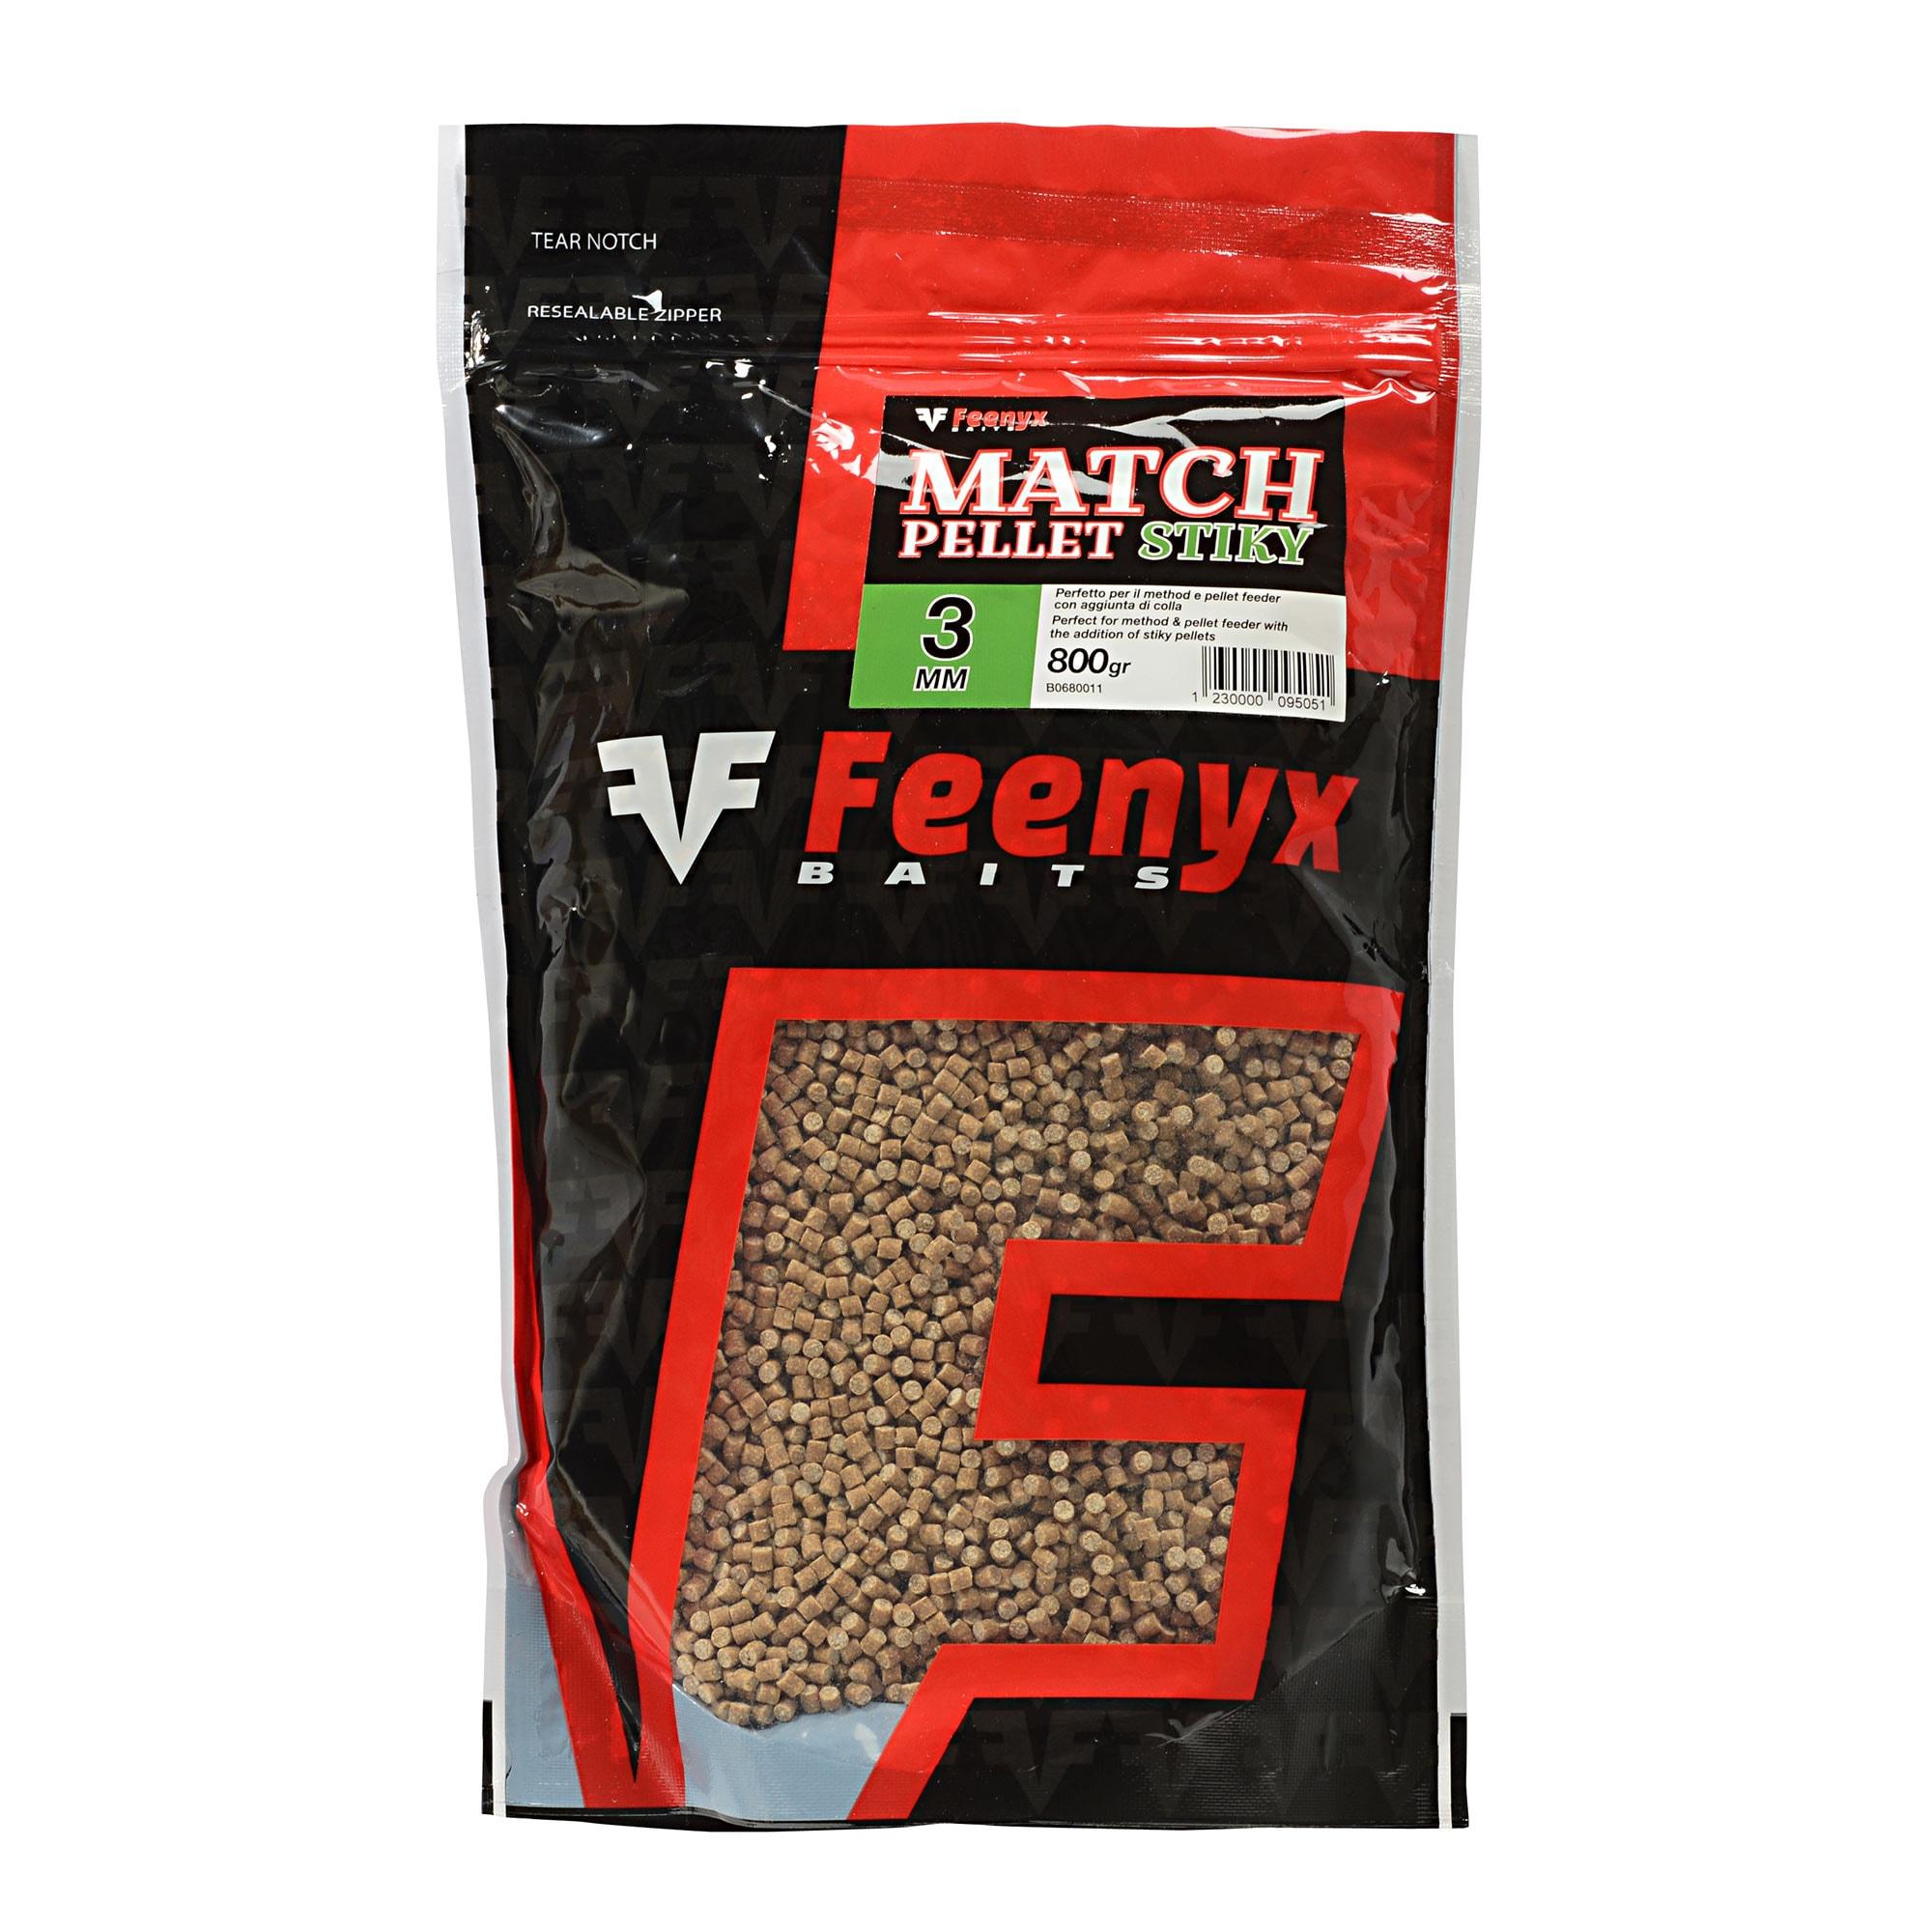 Match Pellet Stiky 3mm FEENYX BAIT (800gr.)